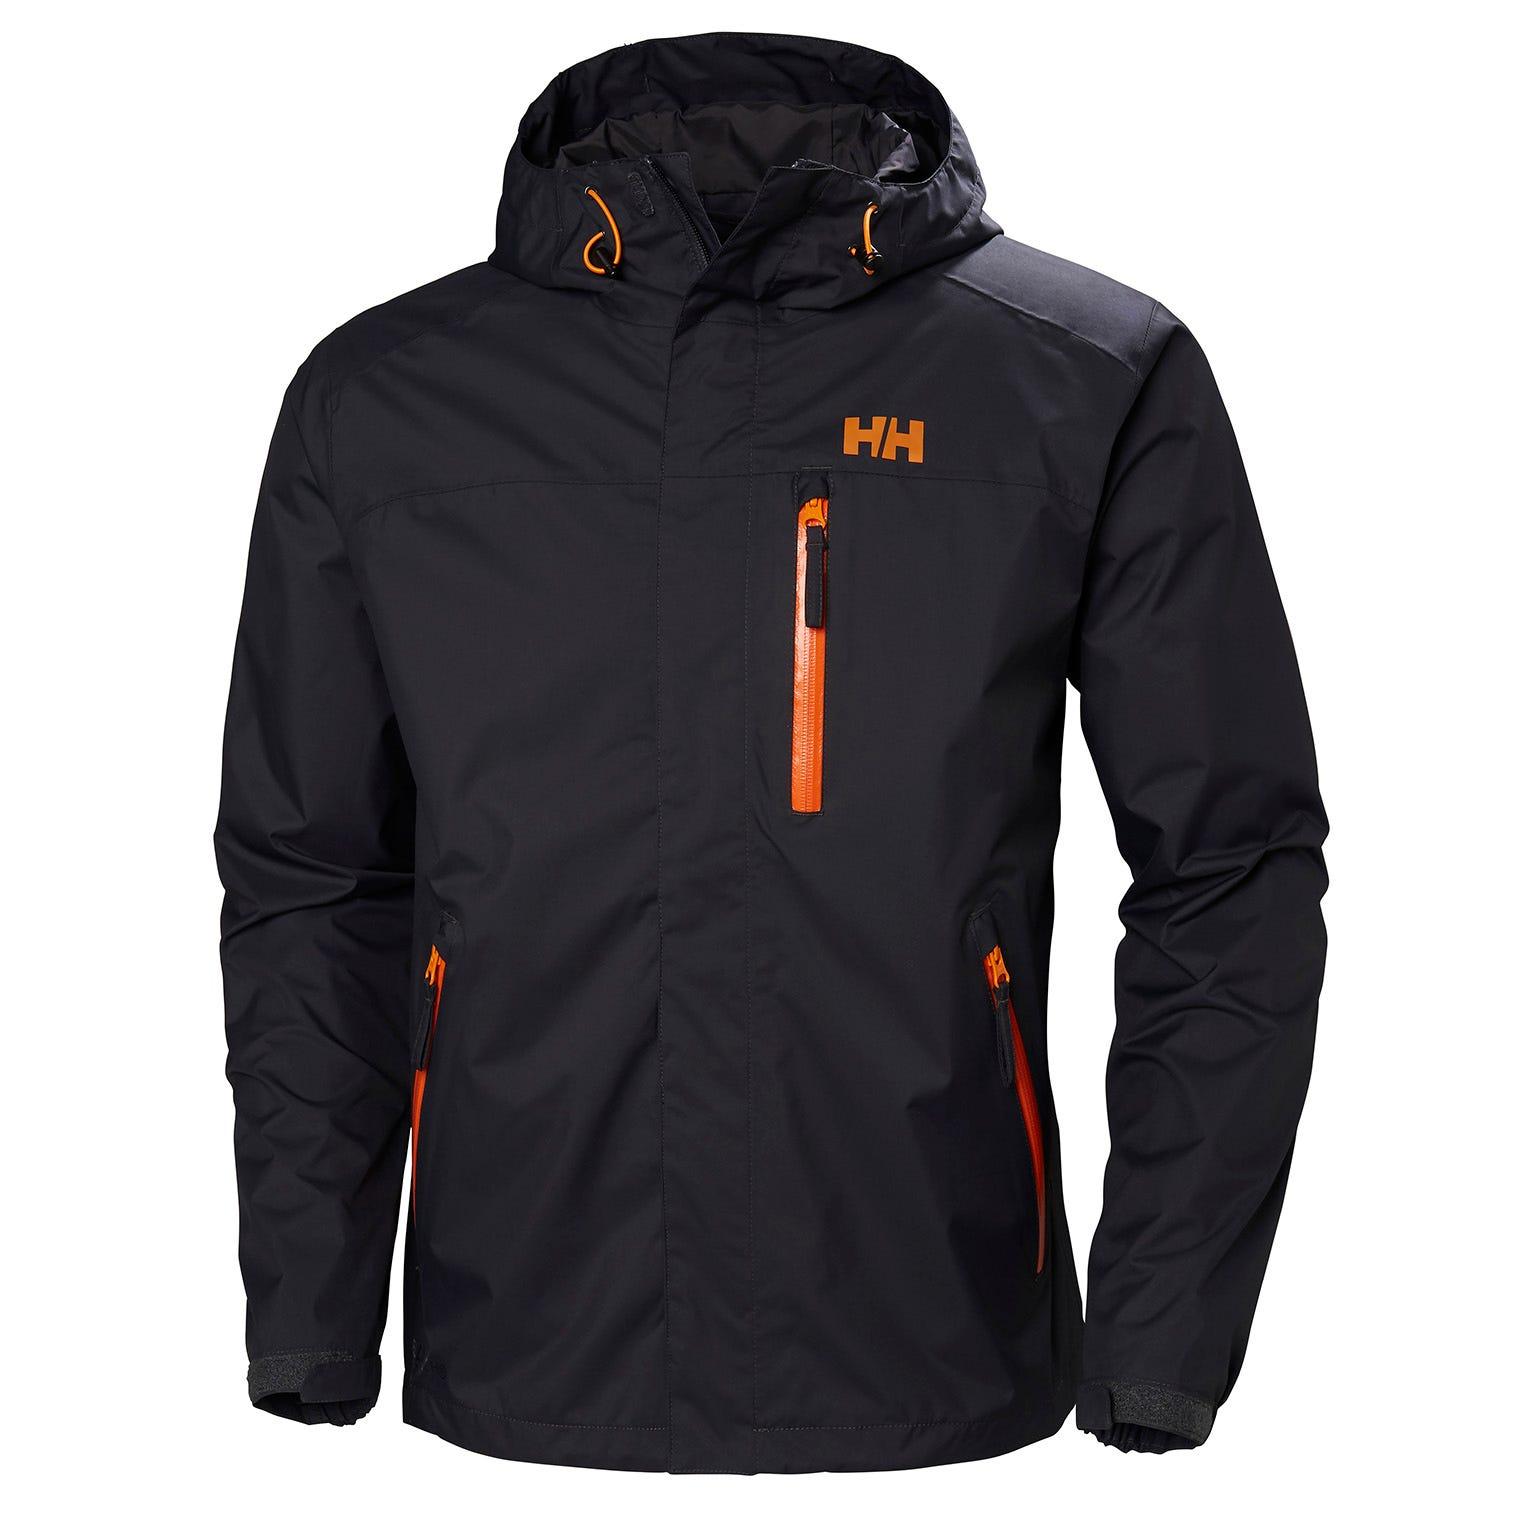 8d2b101b11a Vancouver Jacket | Mens Shell Outdoor Rain Jacket | HH US